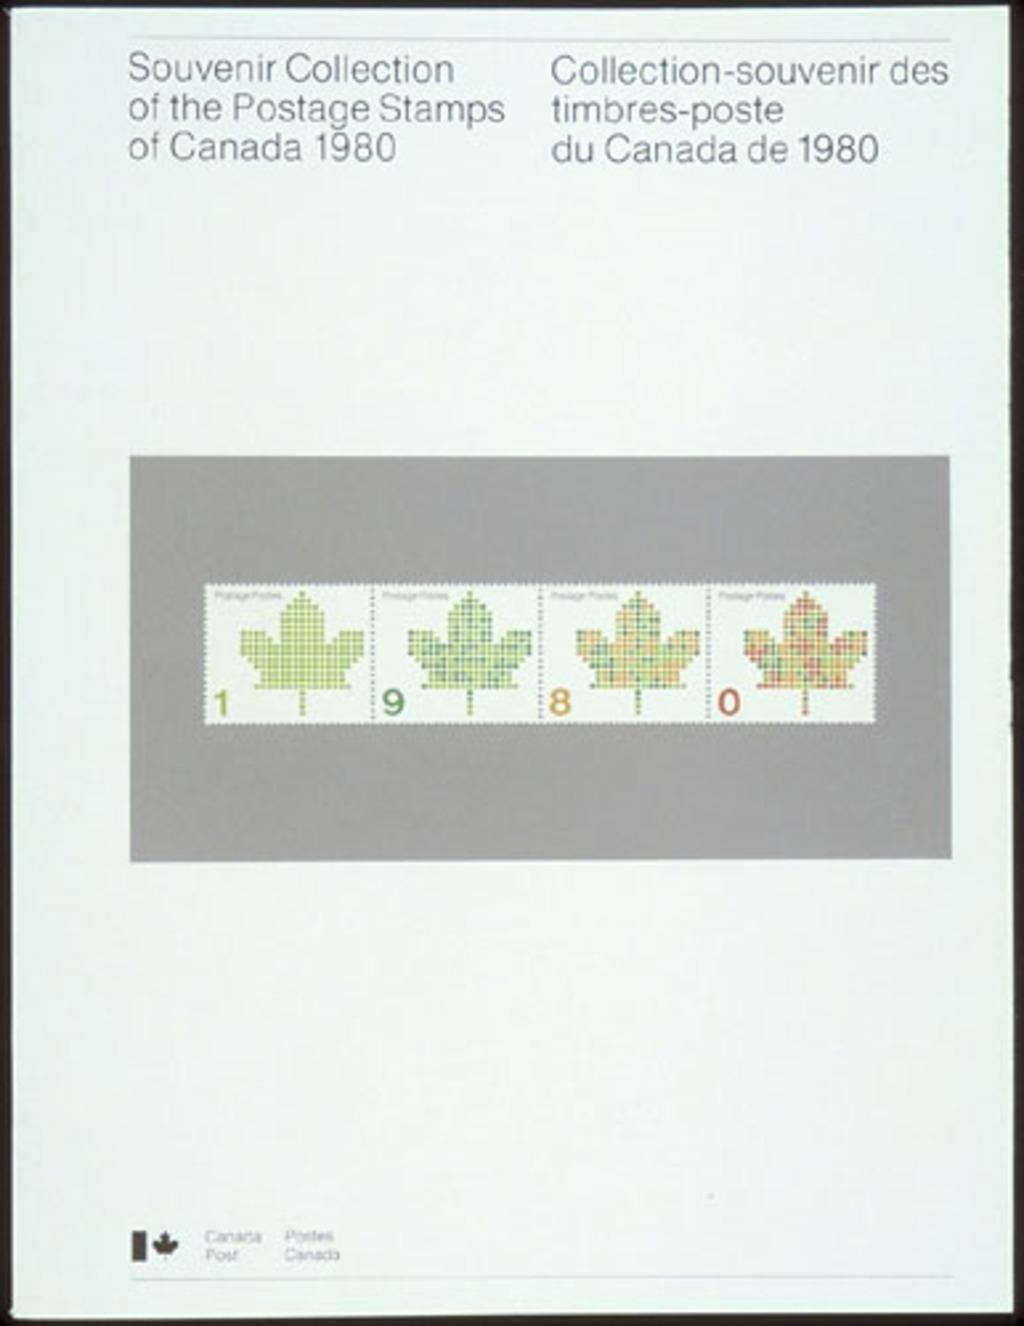 Collection-souvenir des timbres-poste du Canada de 1980